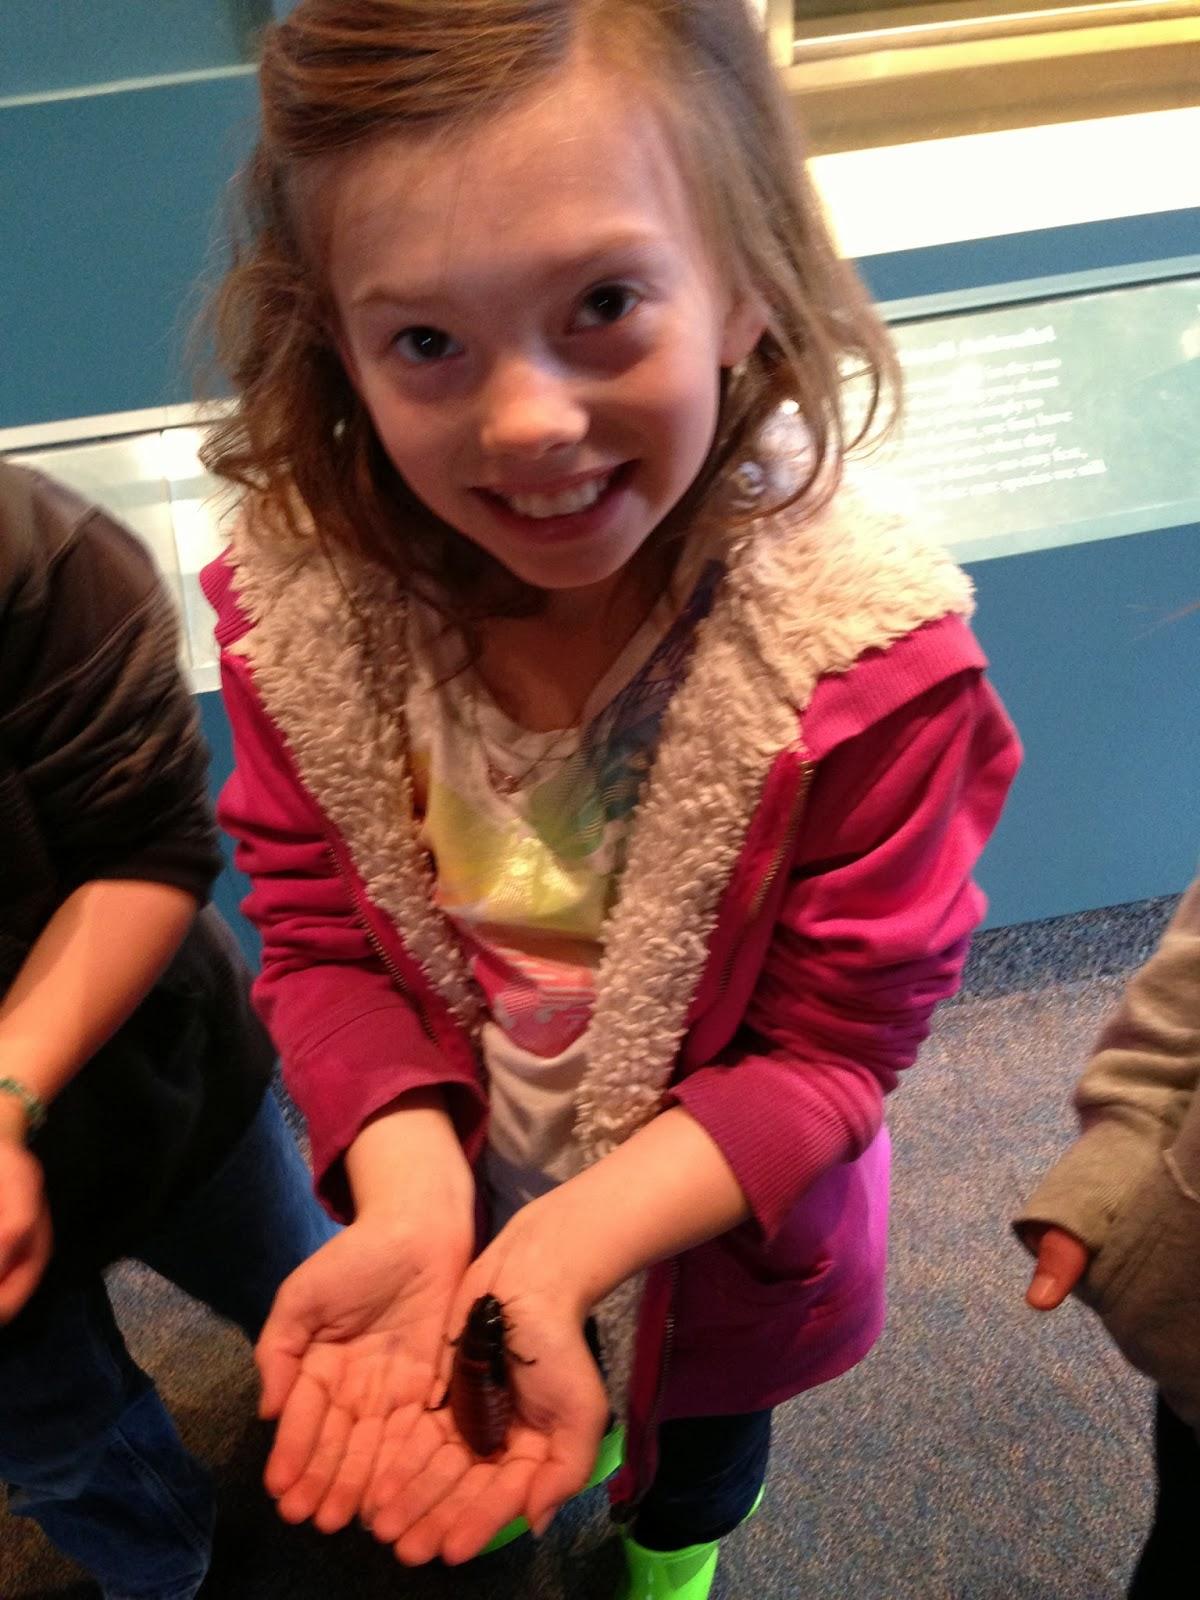 DC natural history museum, girl smiling